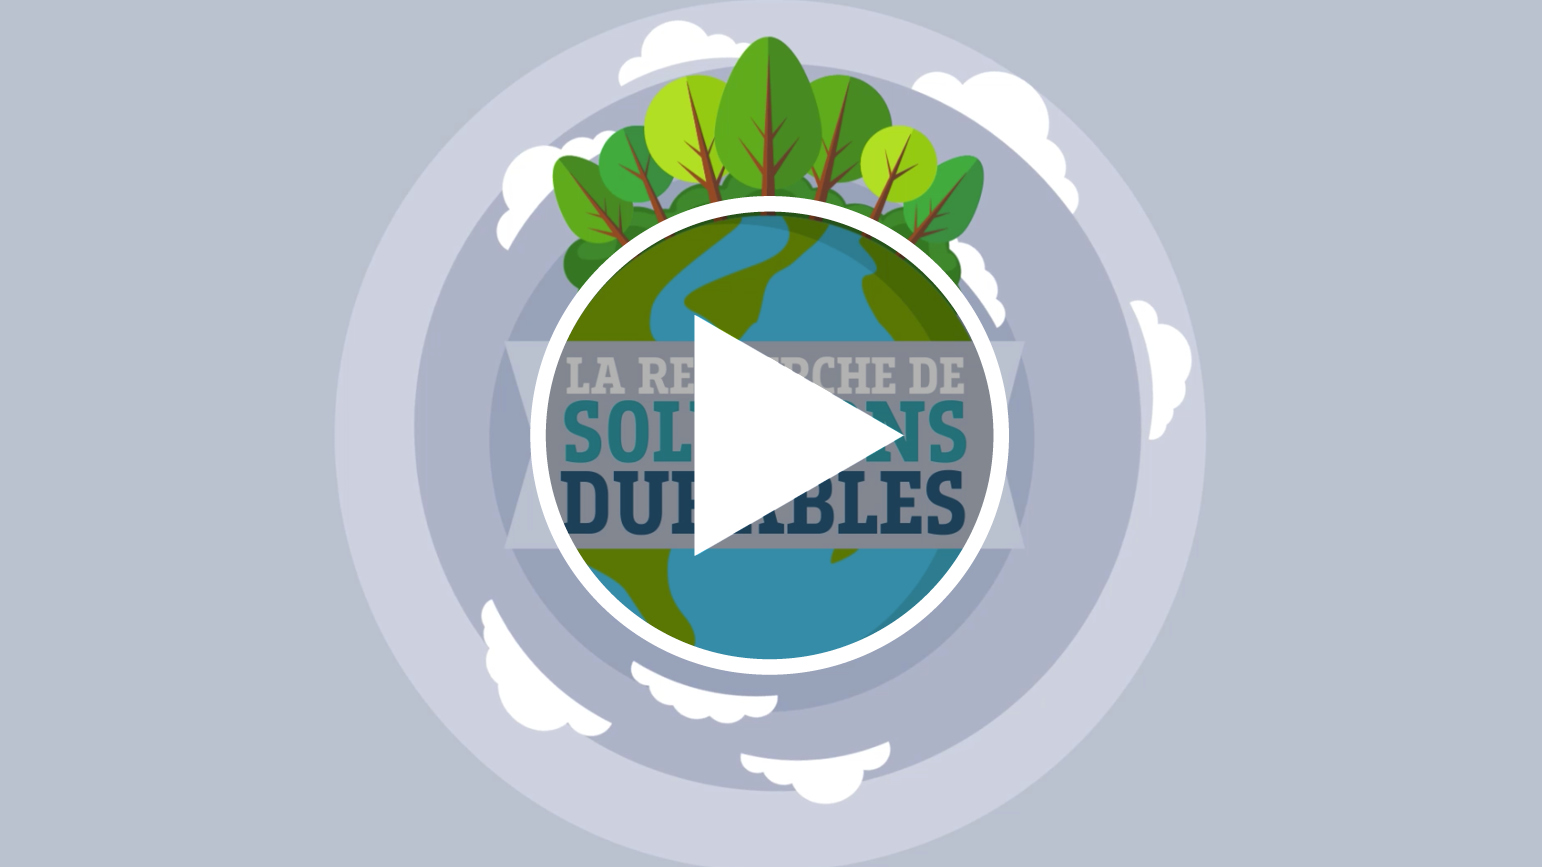 13 - La recherche de solutions durables